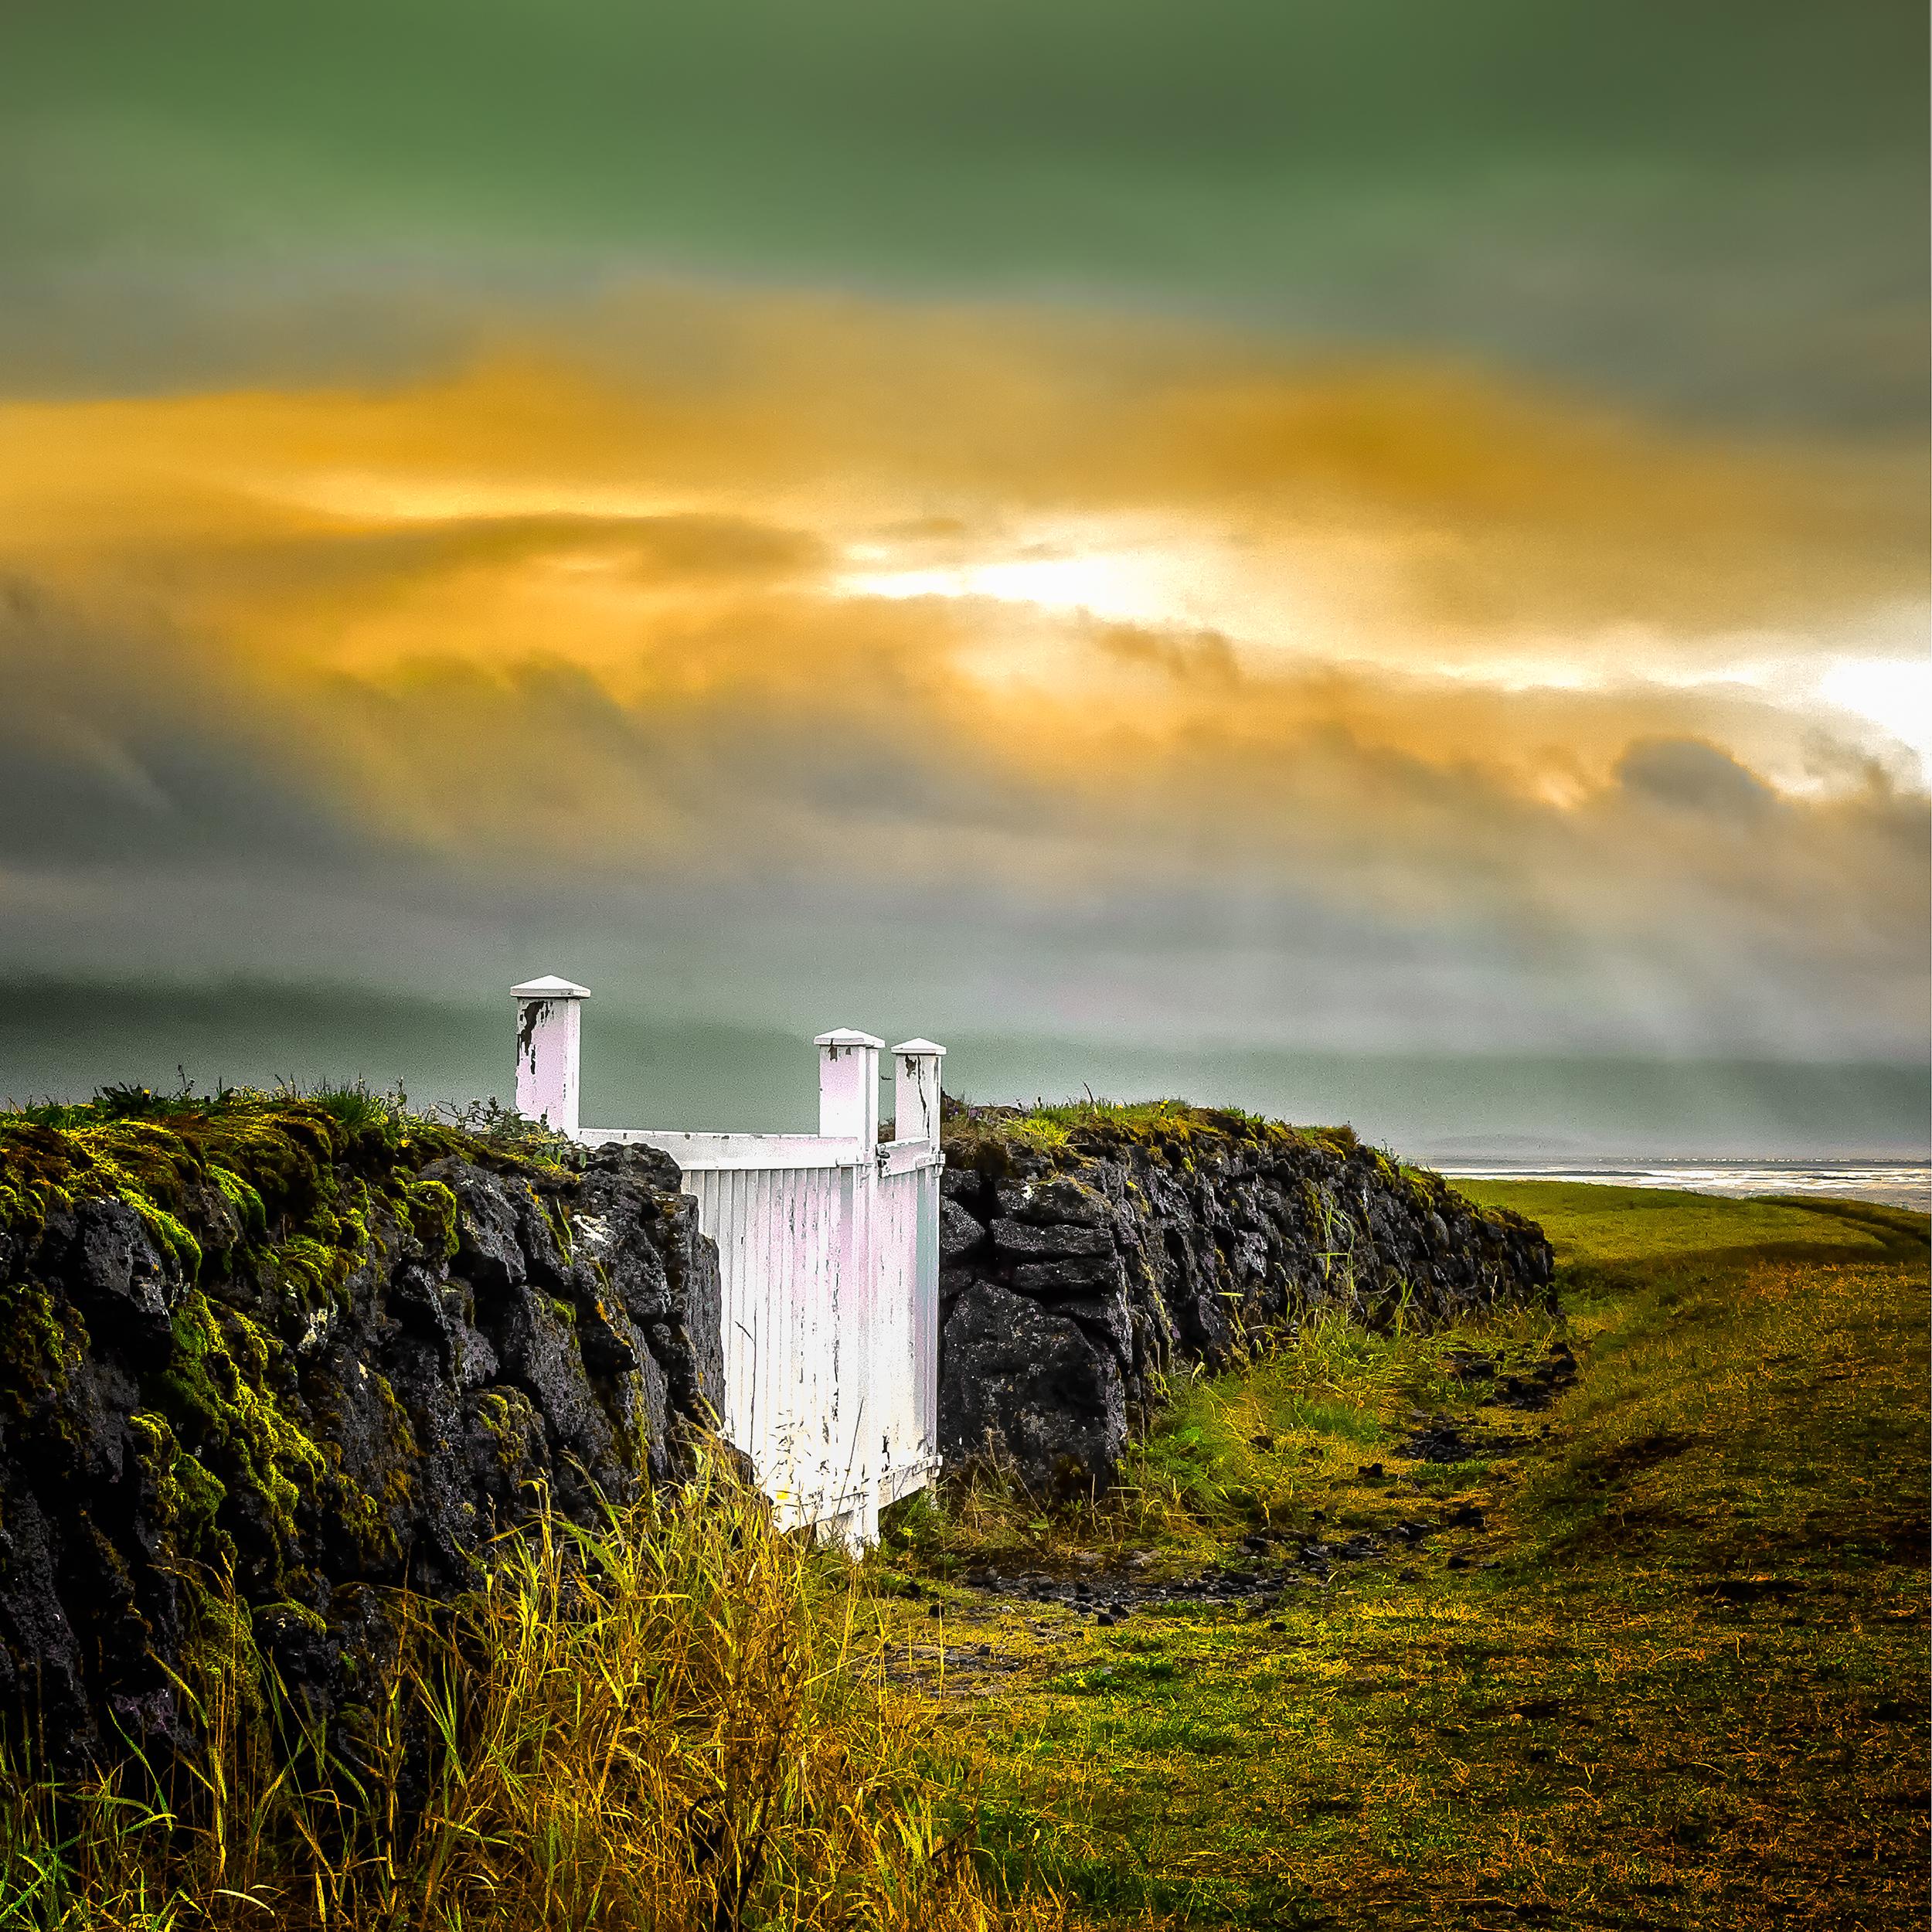 White Gate, Iceland